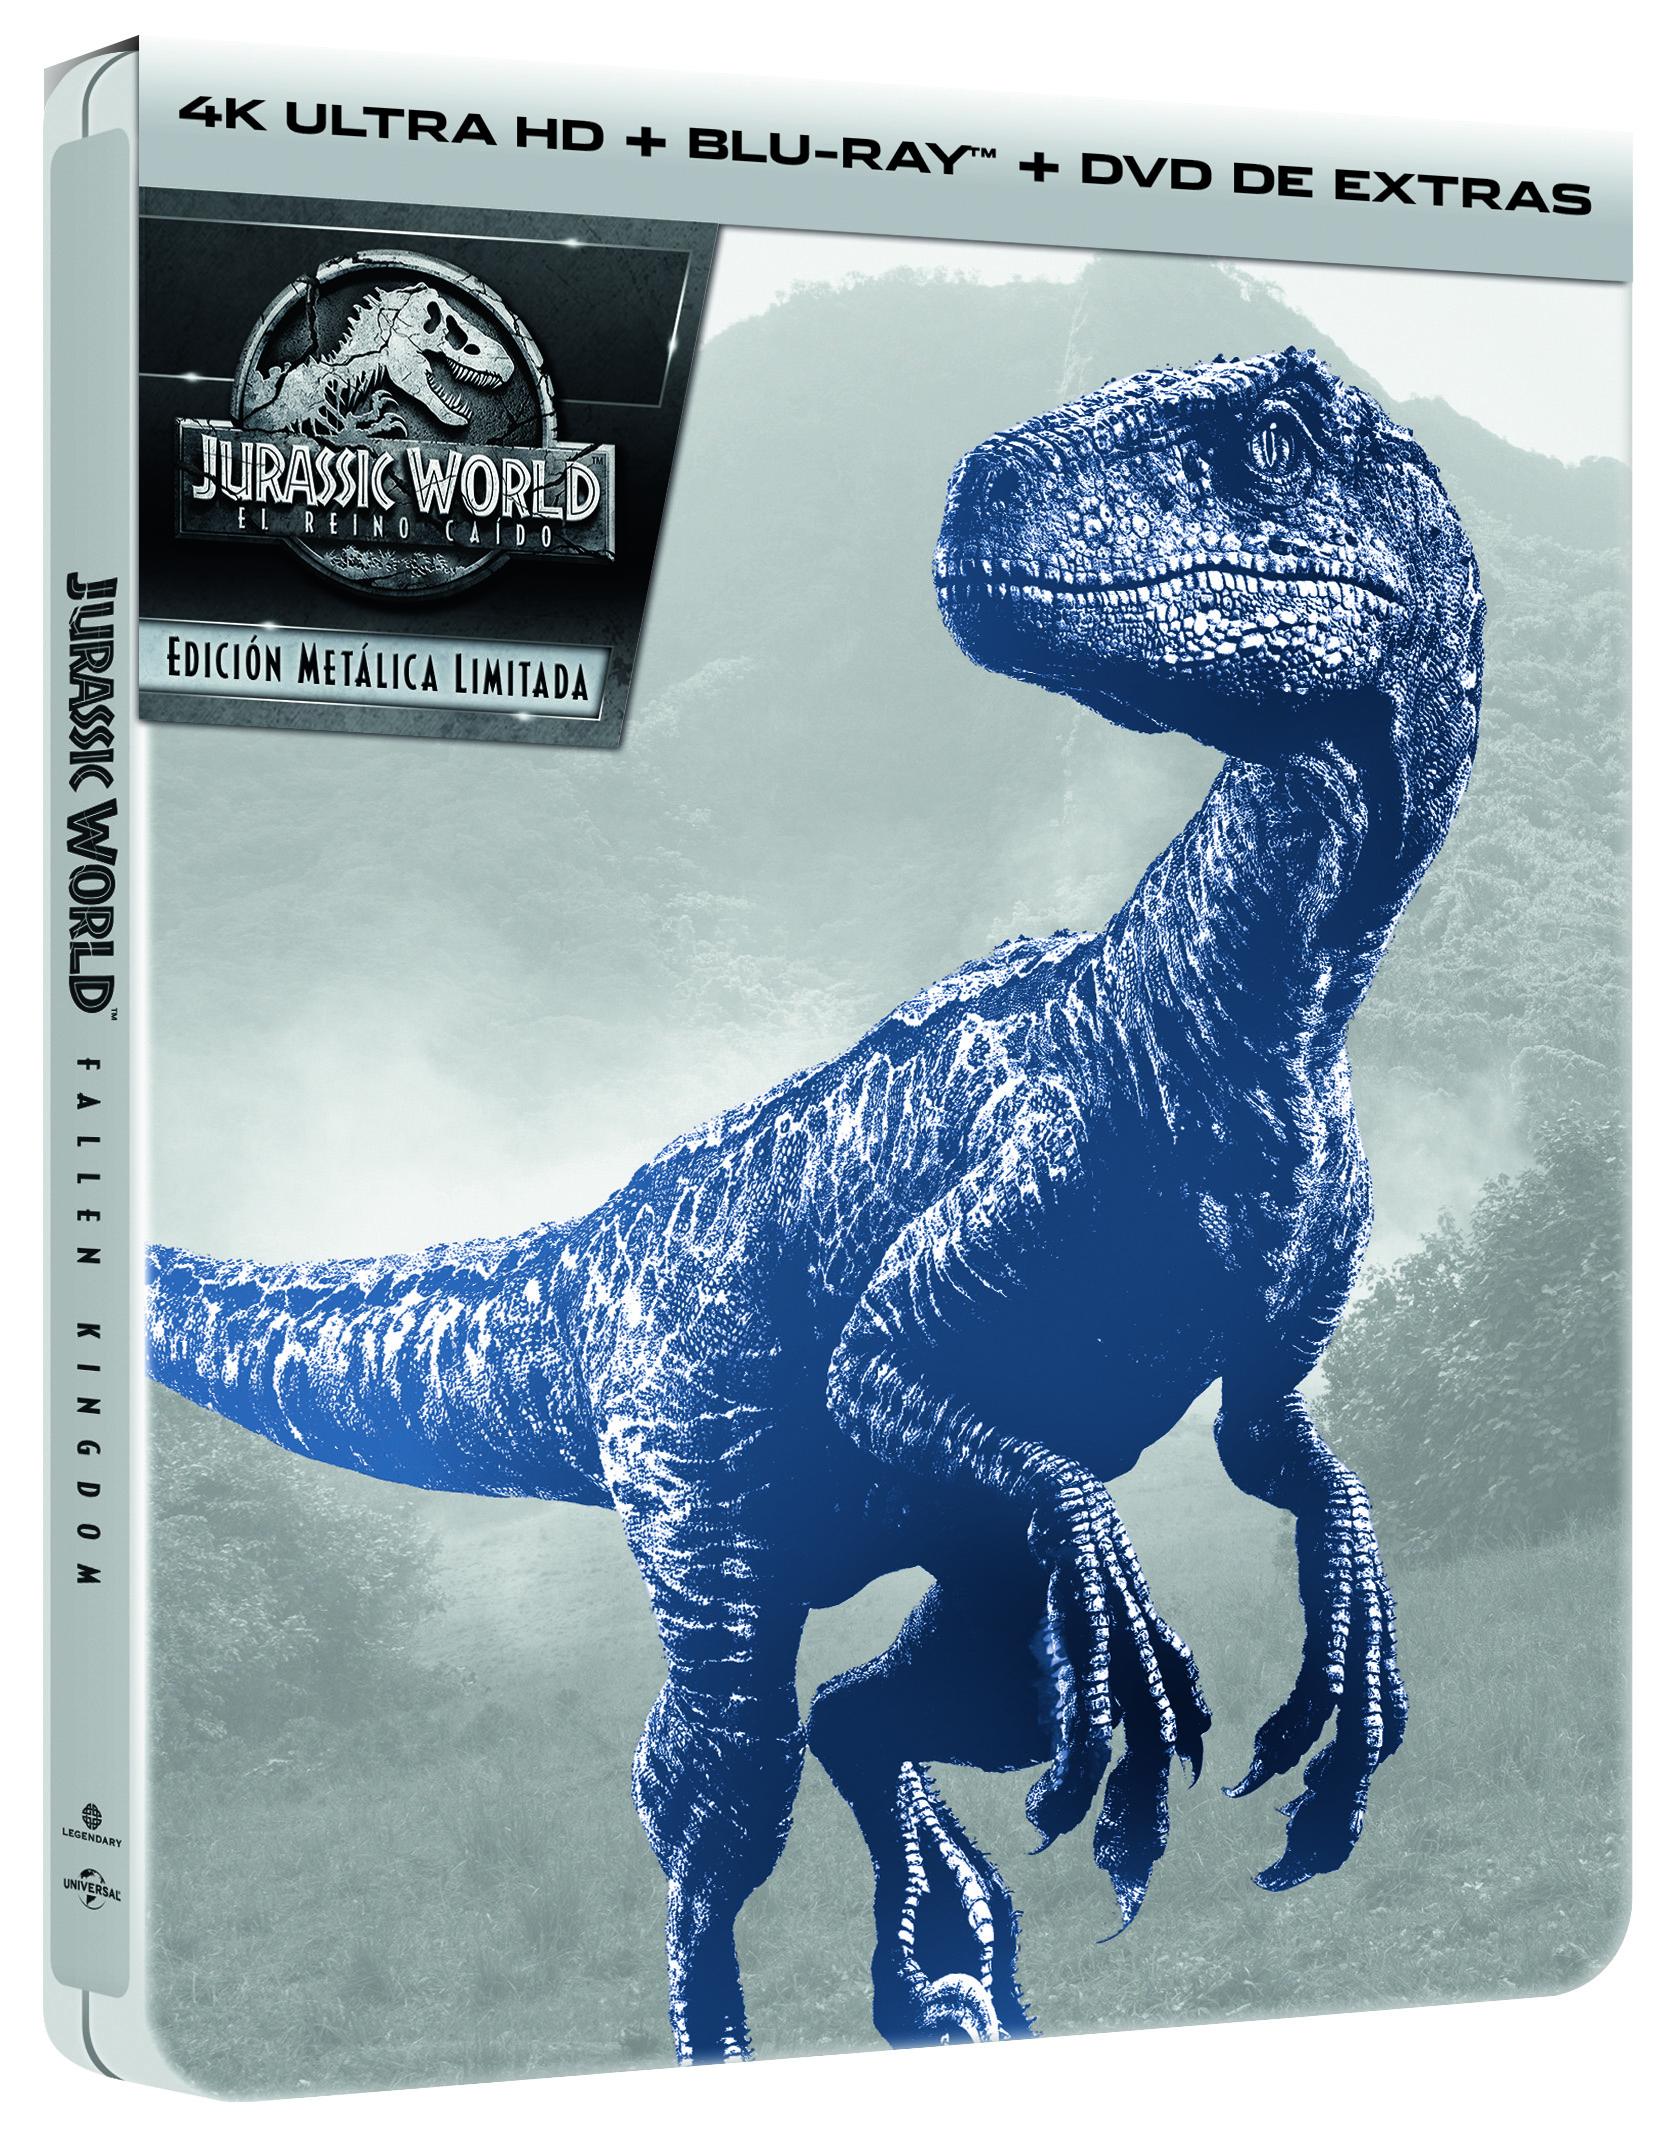 Jurassic World: El Reino Caído Steelbook 4K Ultra HD